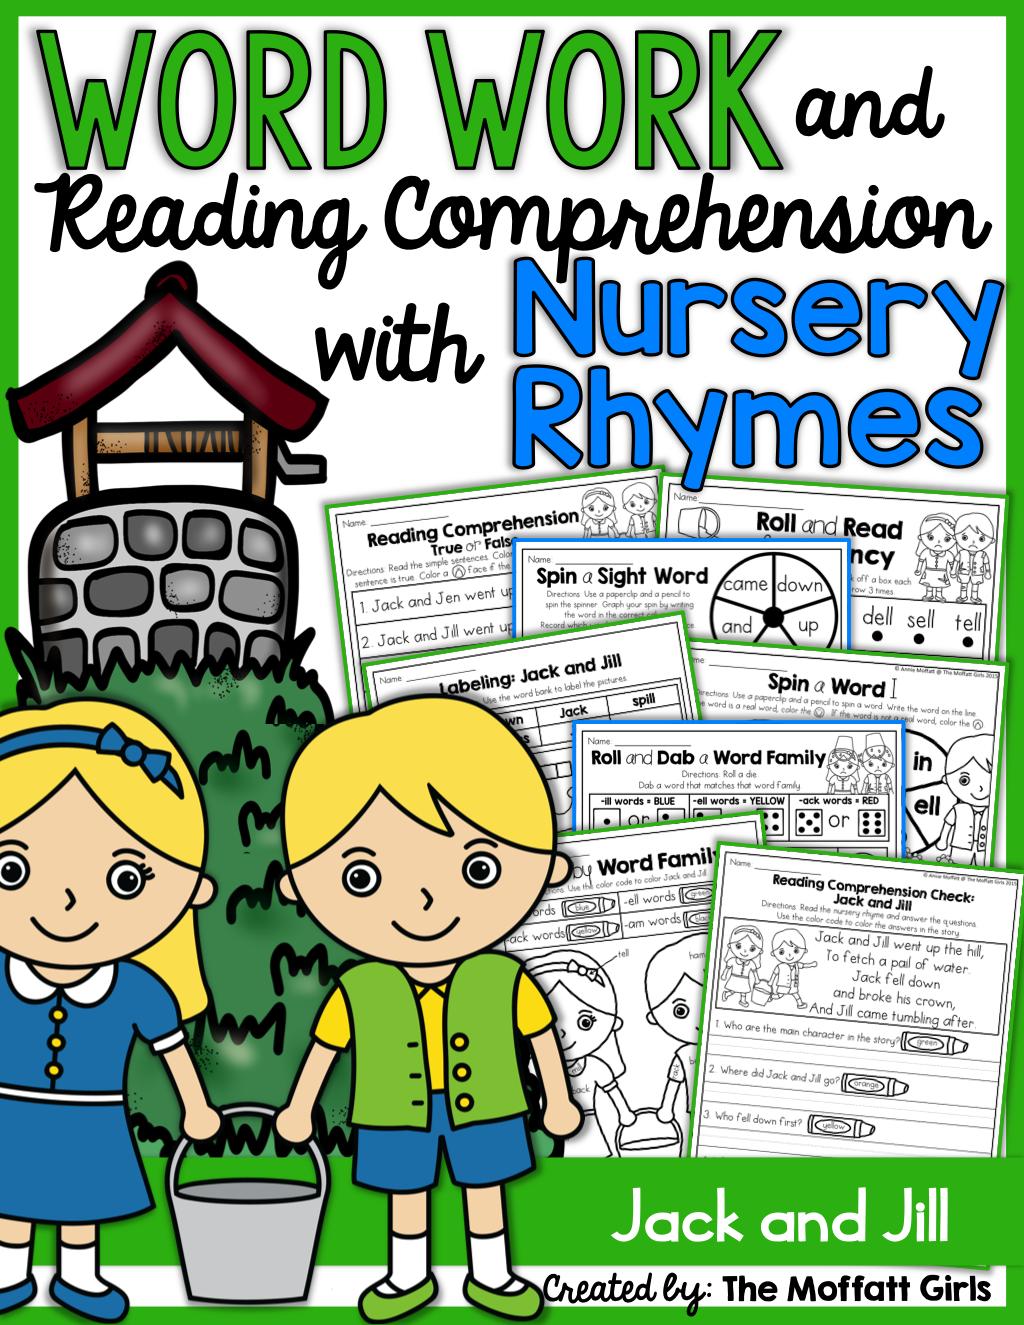 Teaching Word Work And Reading Comprehension Through Nursery Rhymes